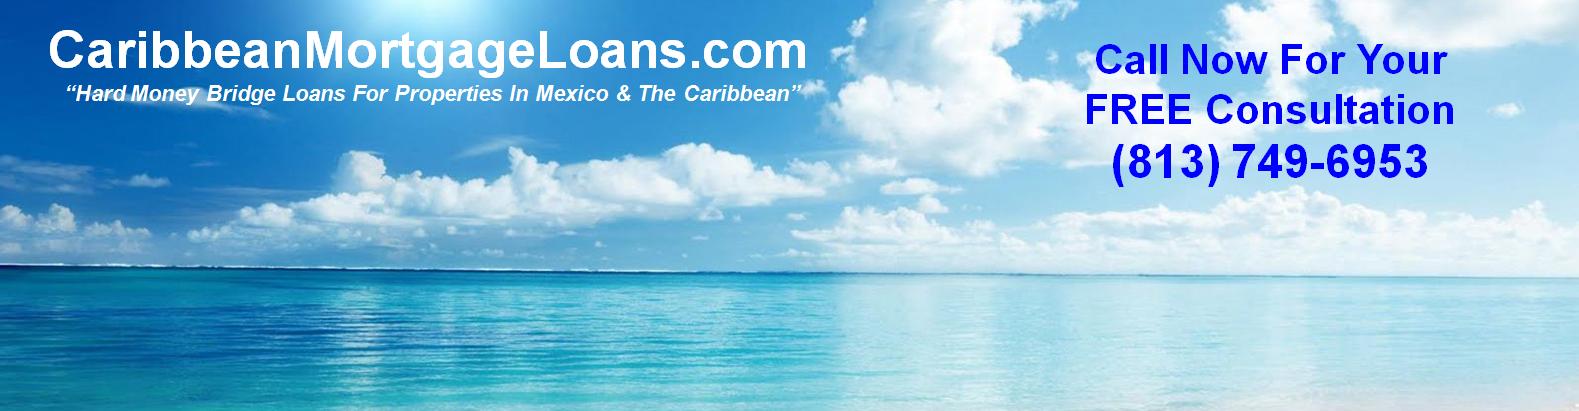 CaribbeanMortgageLoans.com